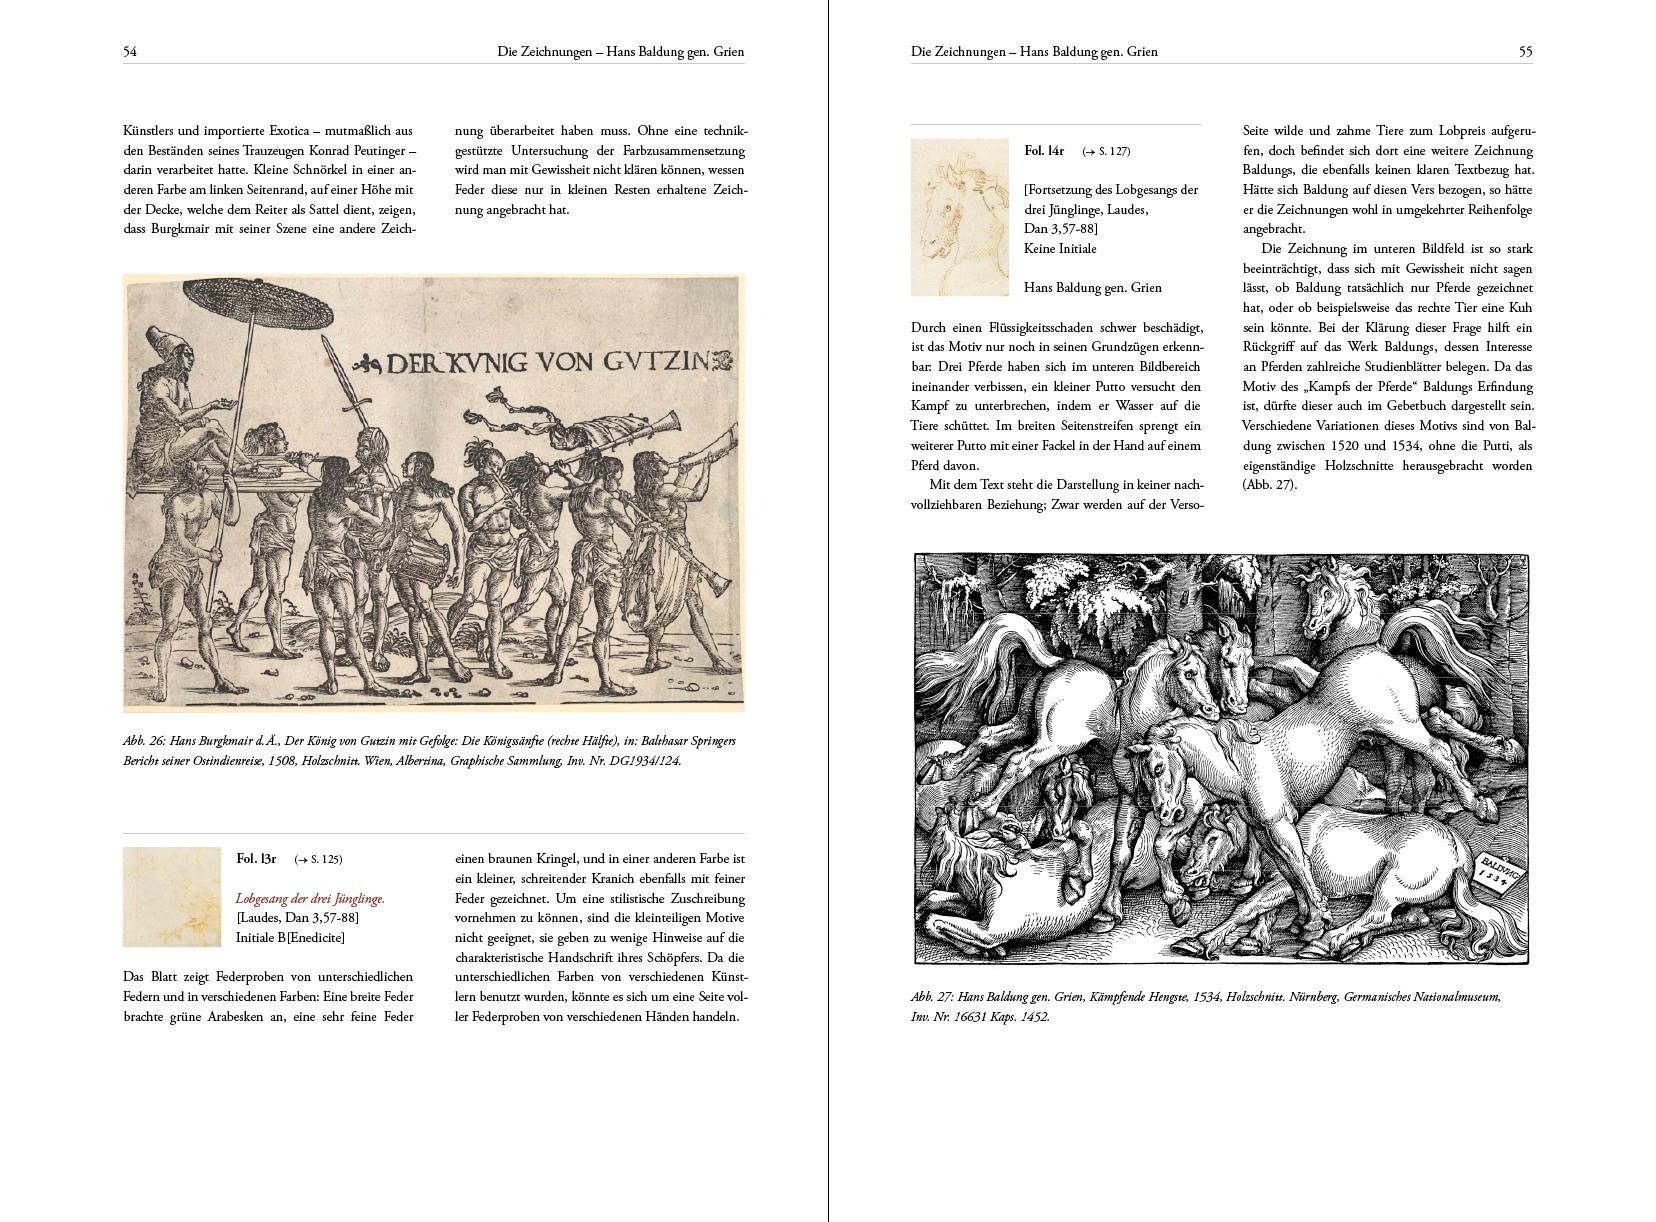 Gebetbuch Kaiser Maximilians I., Kunstbuch-Edition, Textband, p. 54-55